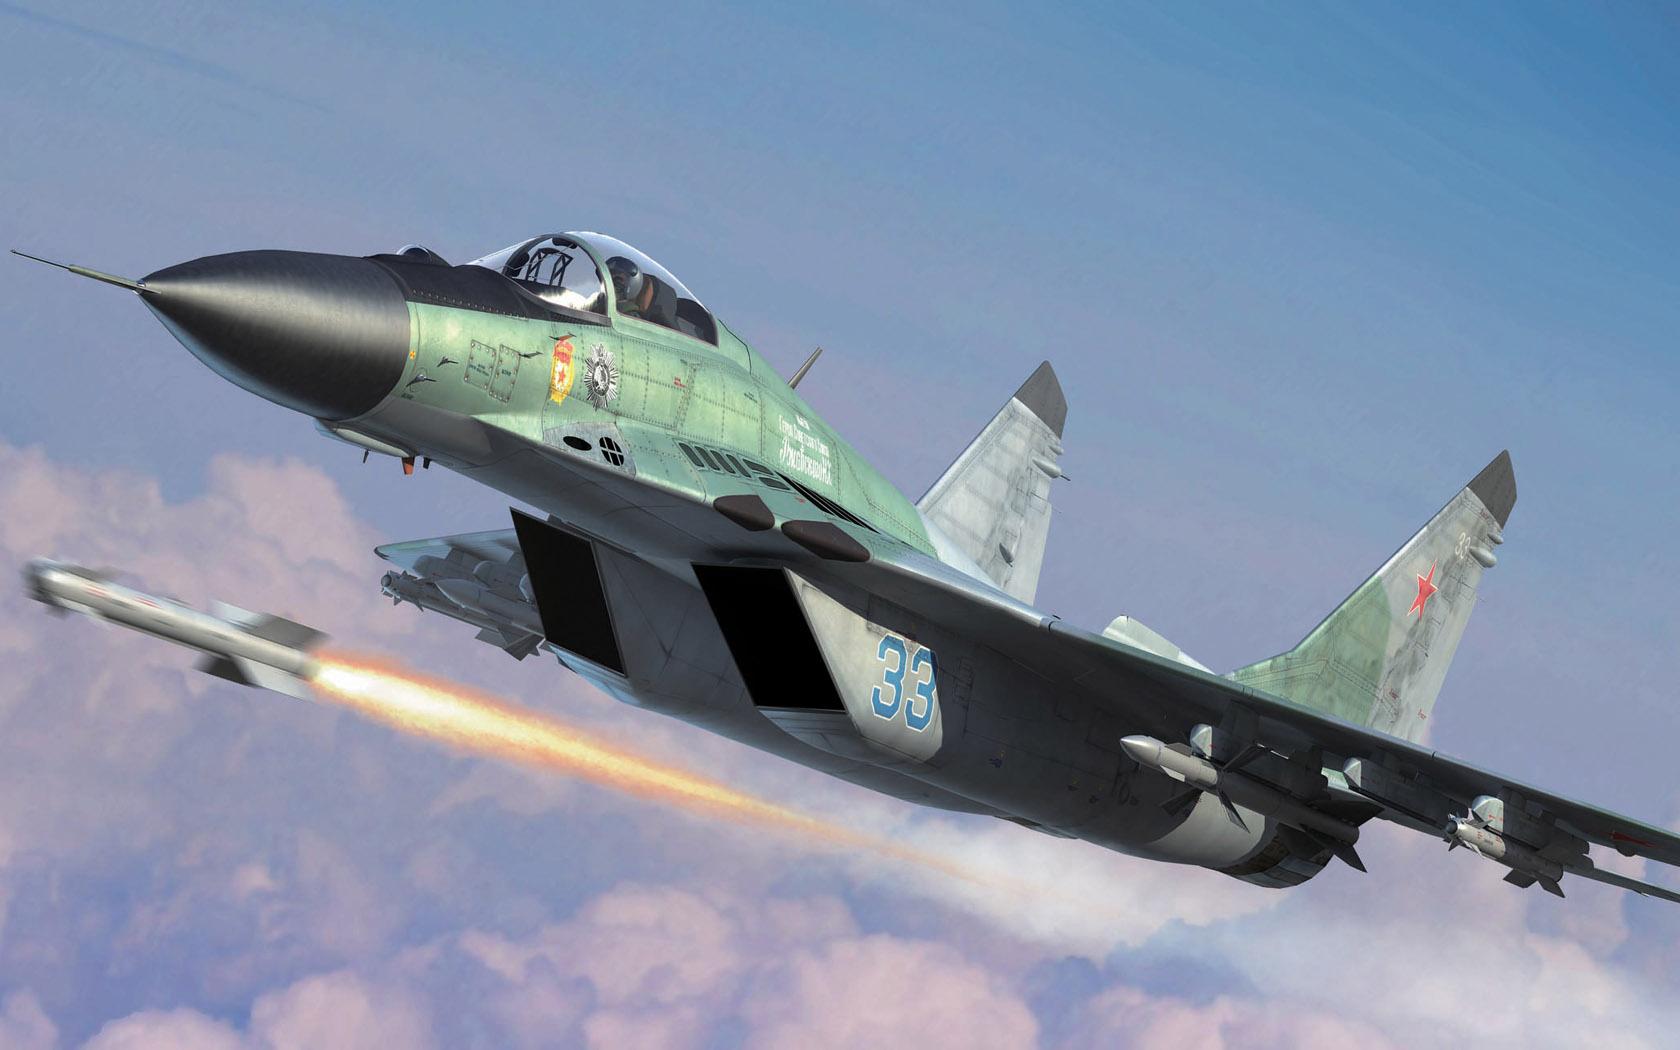 рисунок Mig-29S 9.13 Fulcrum-C